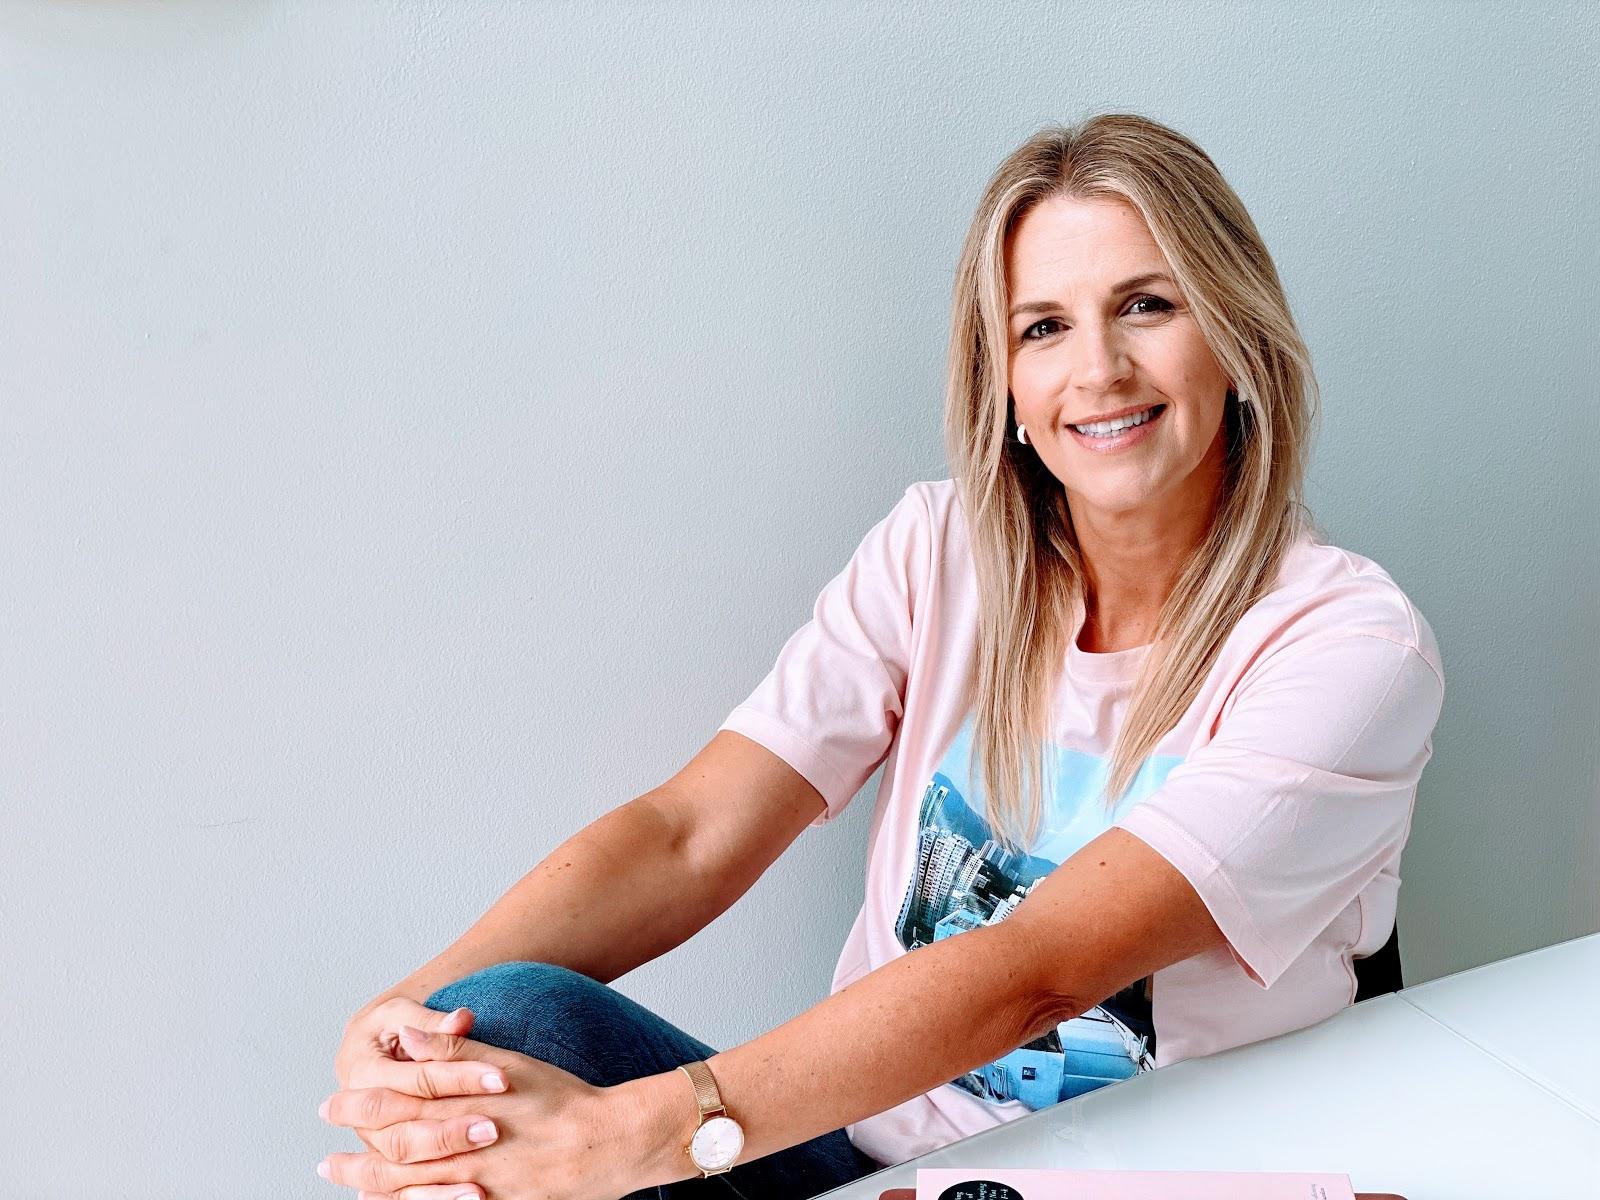 Vicki Harris Shares Her Top Tips For Career Success